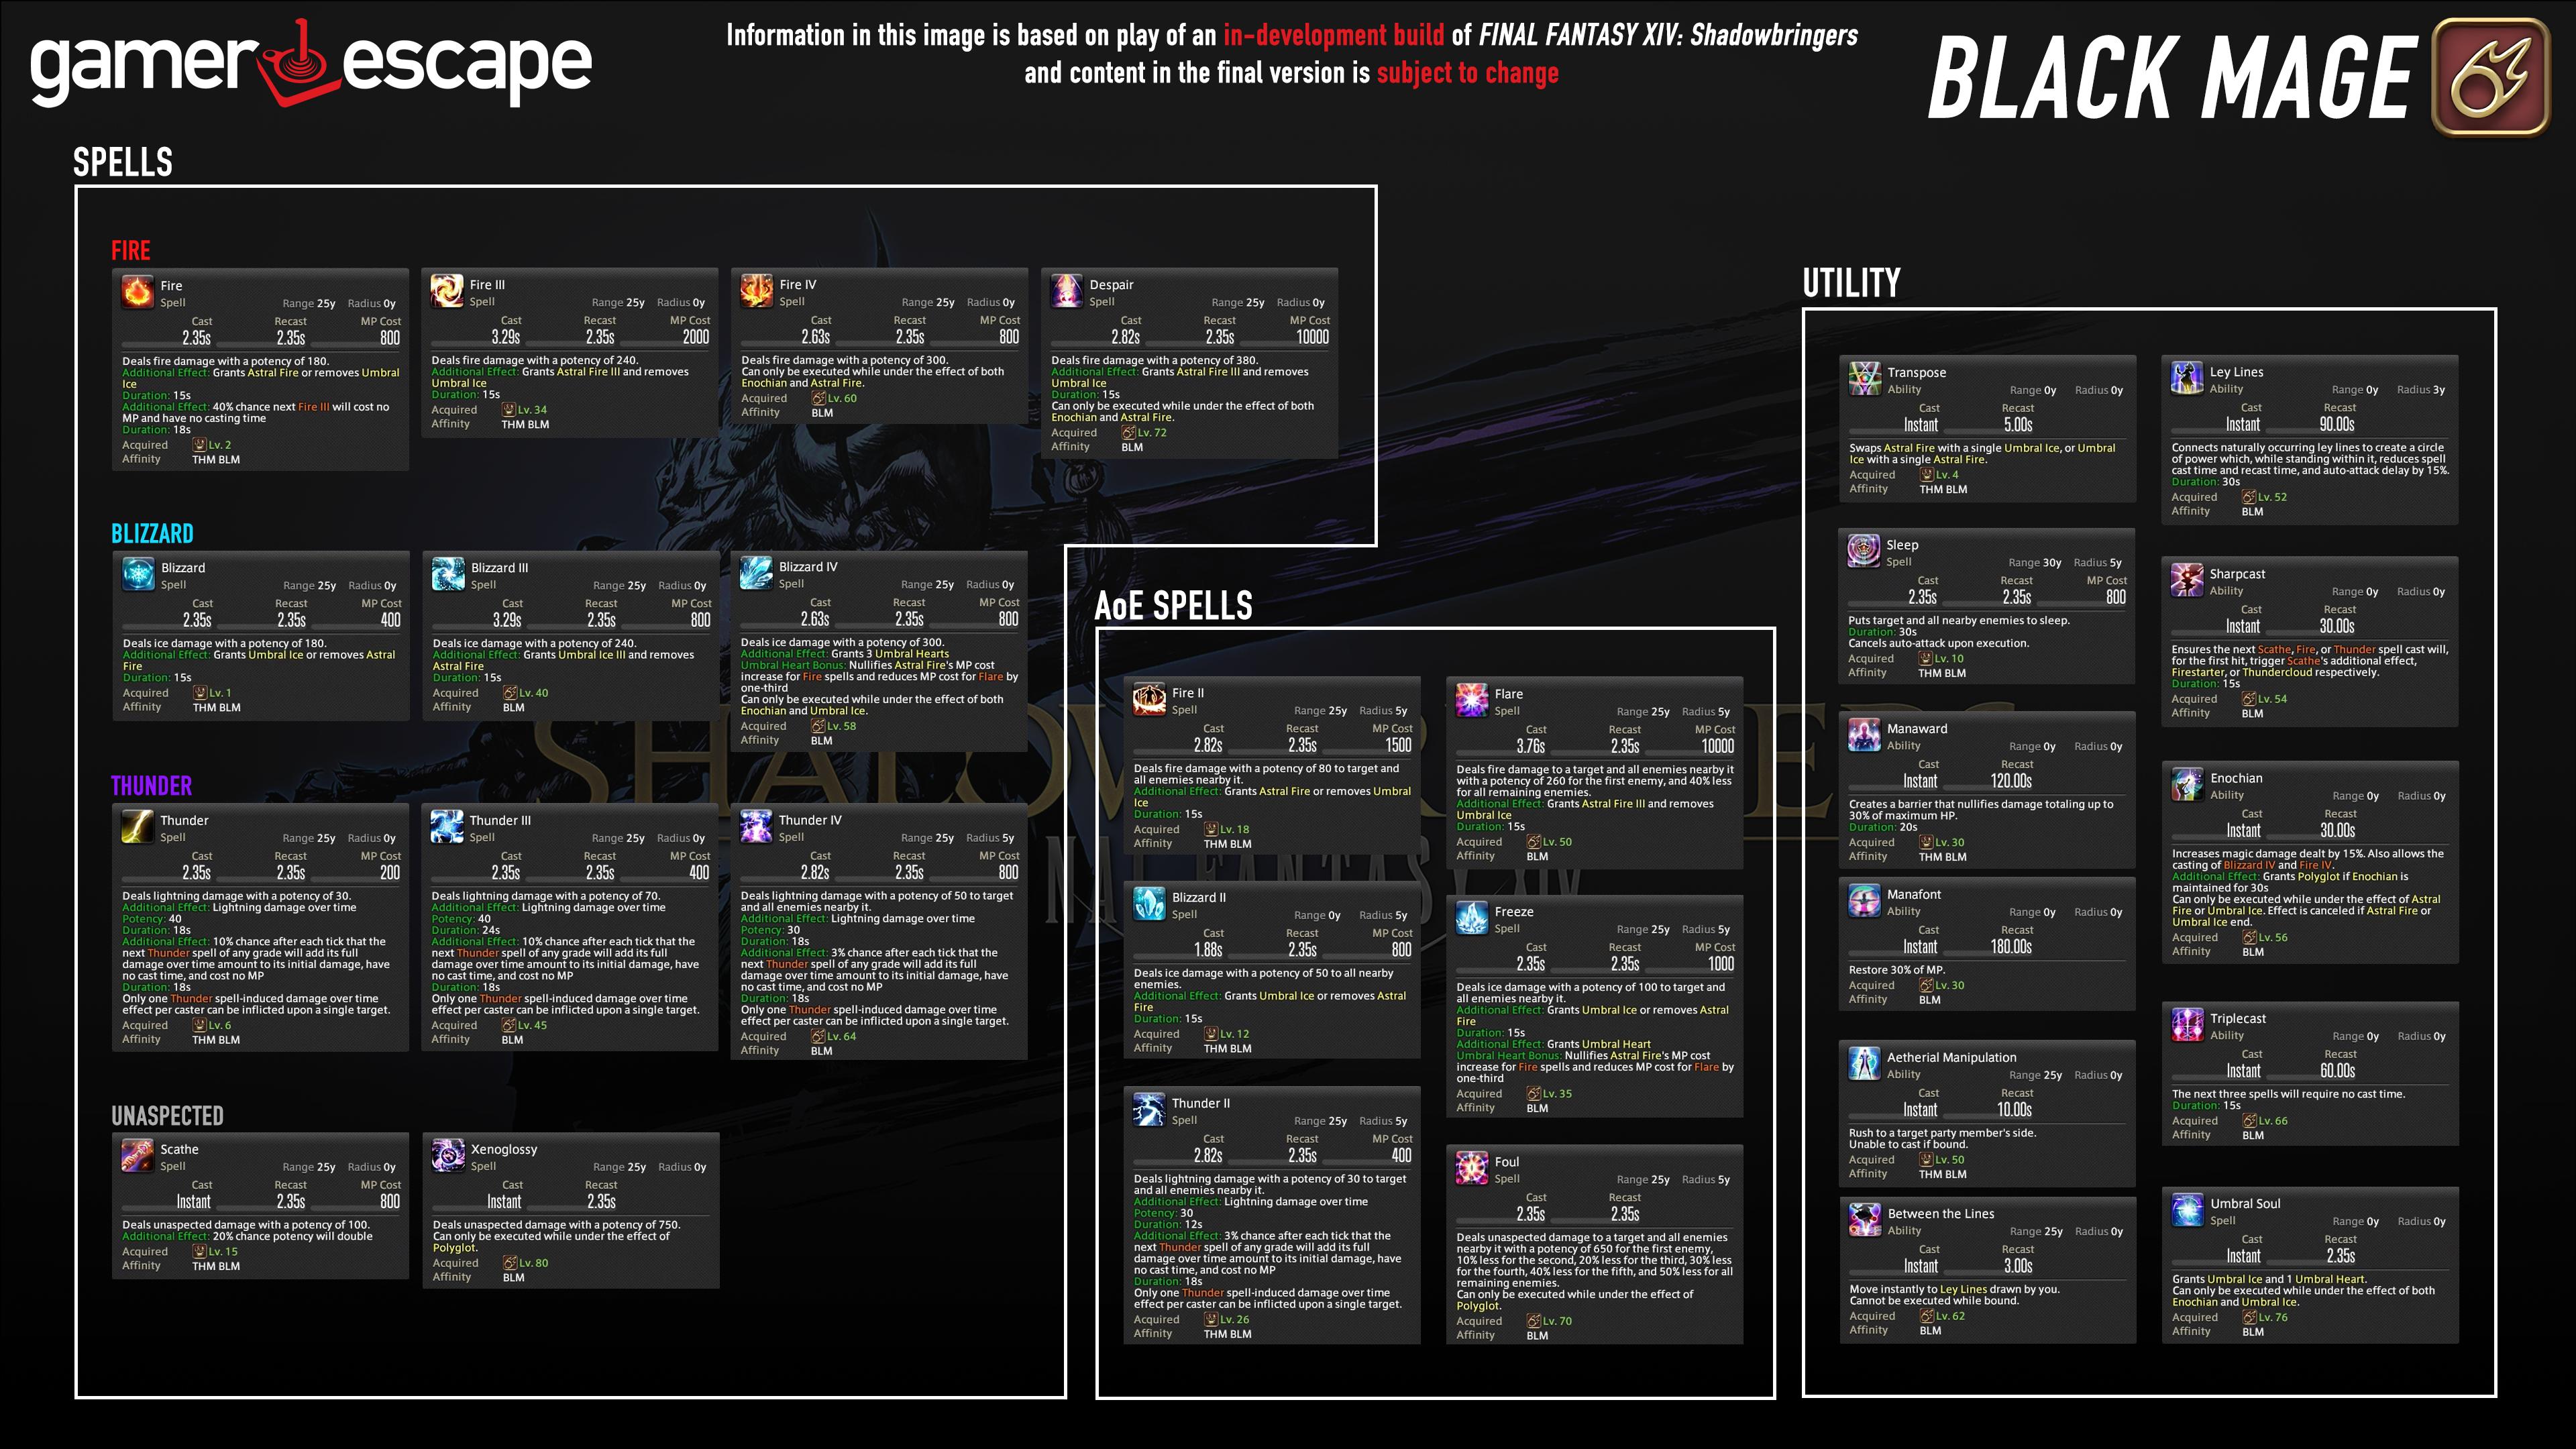 Final Fantasy XIV: Shadowbringers Hands-On with Black Mage